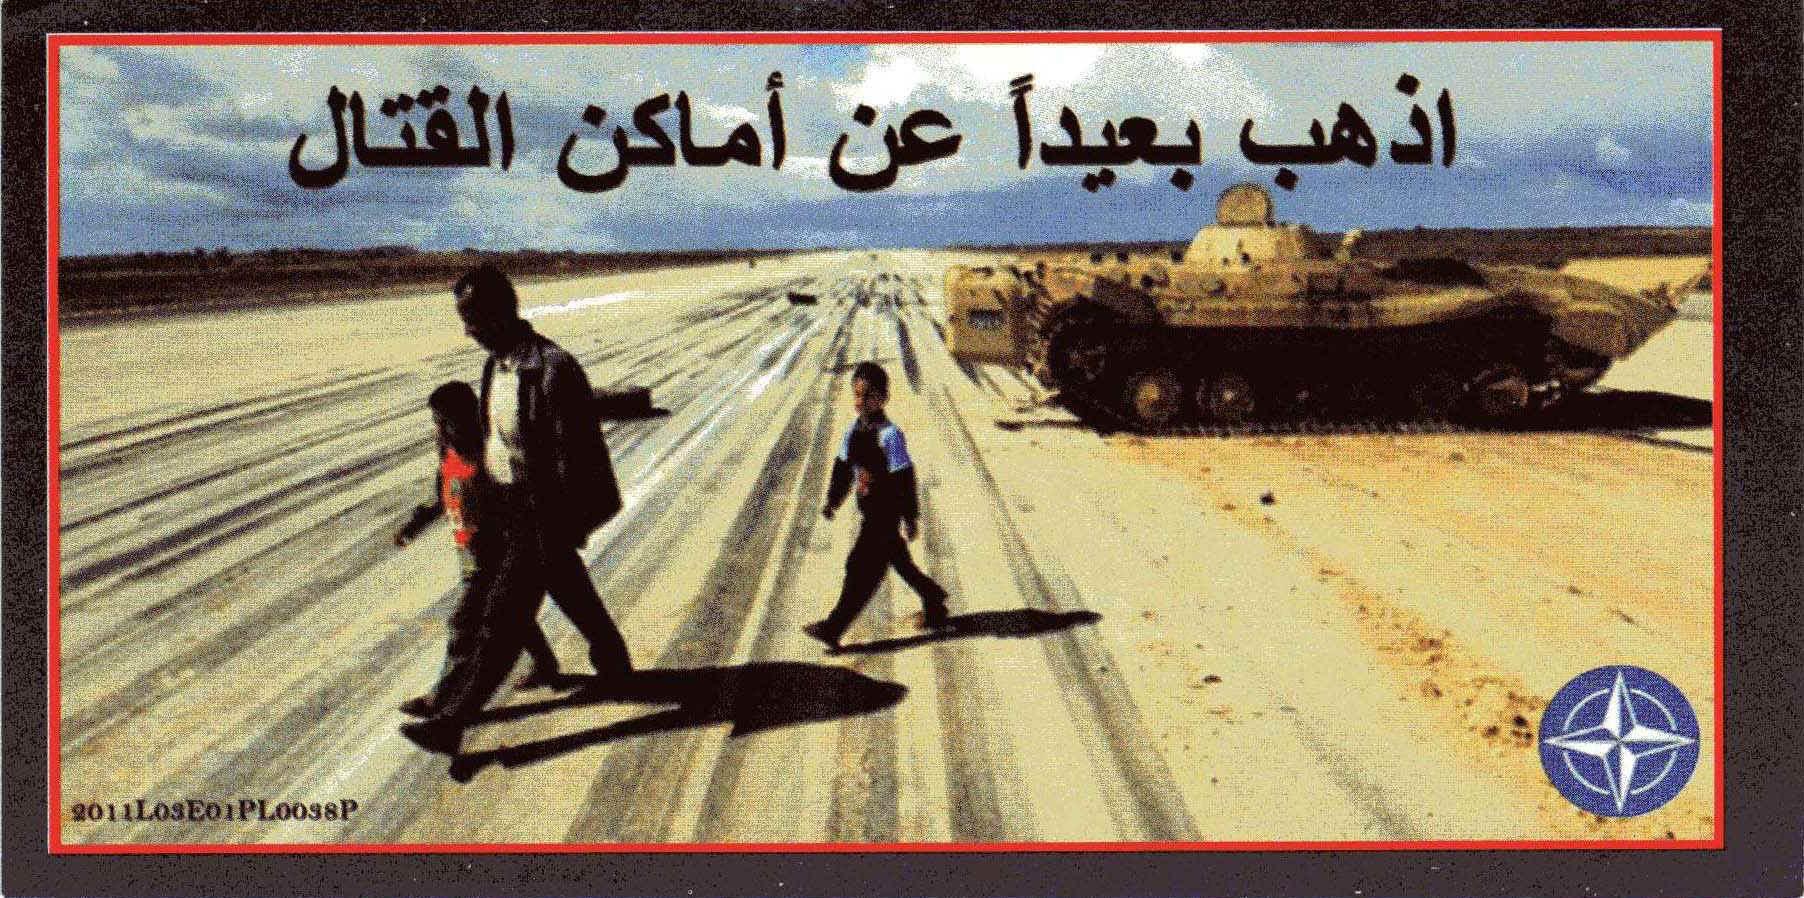 LibyaImg2011a.jpg (340981 bytes)